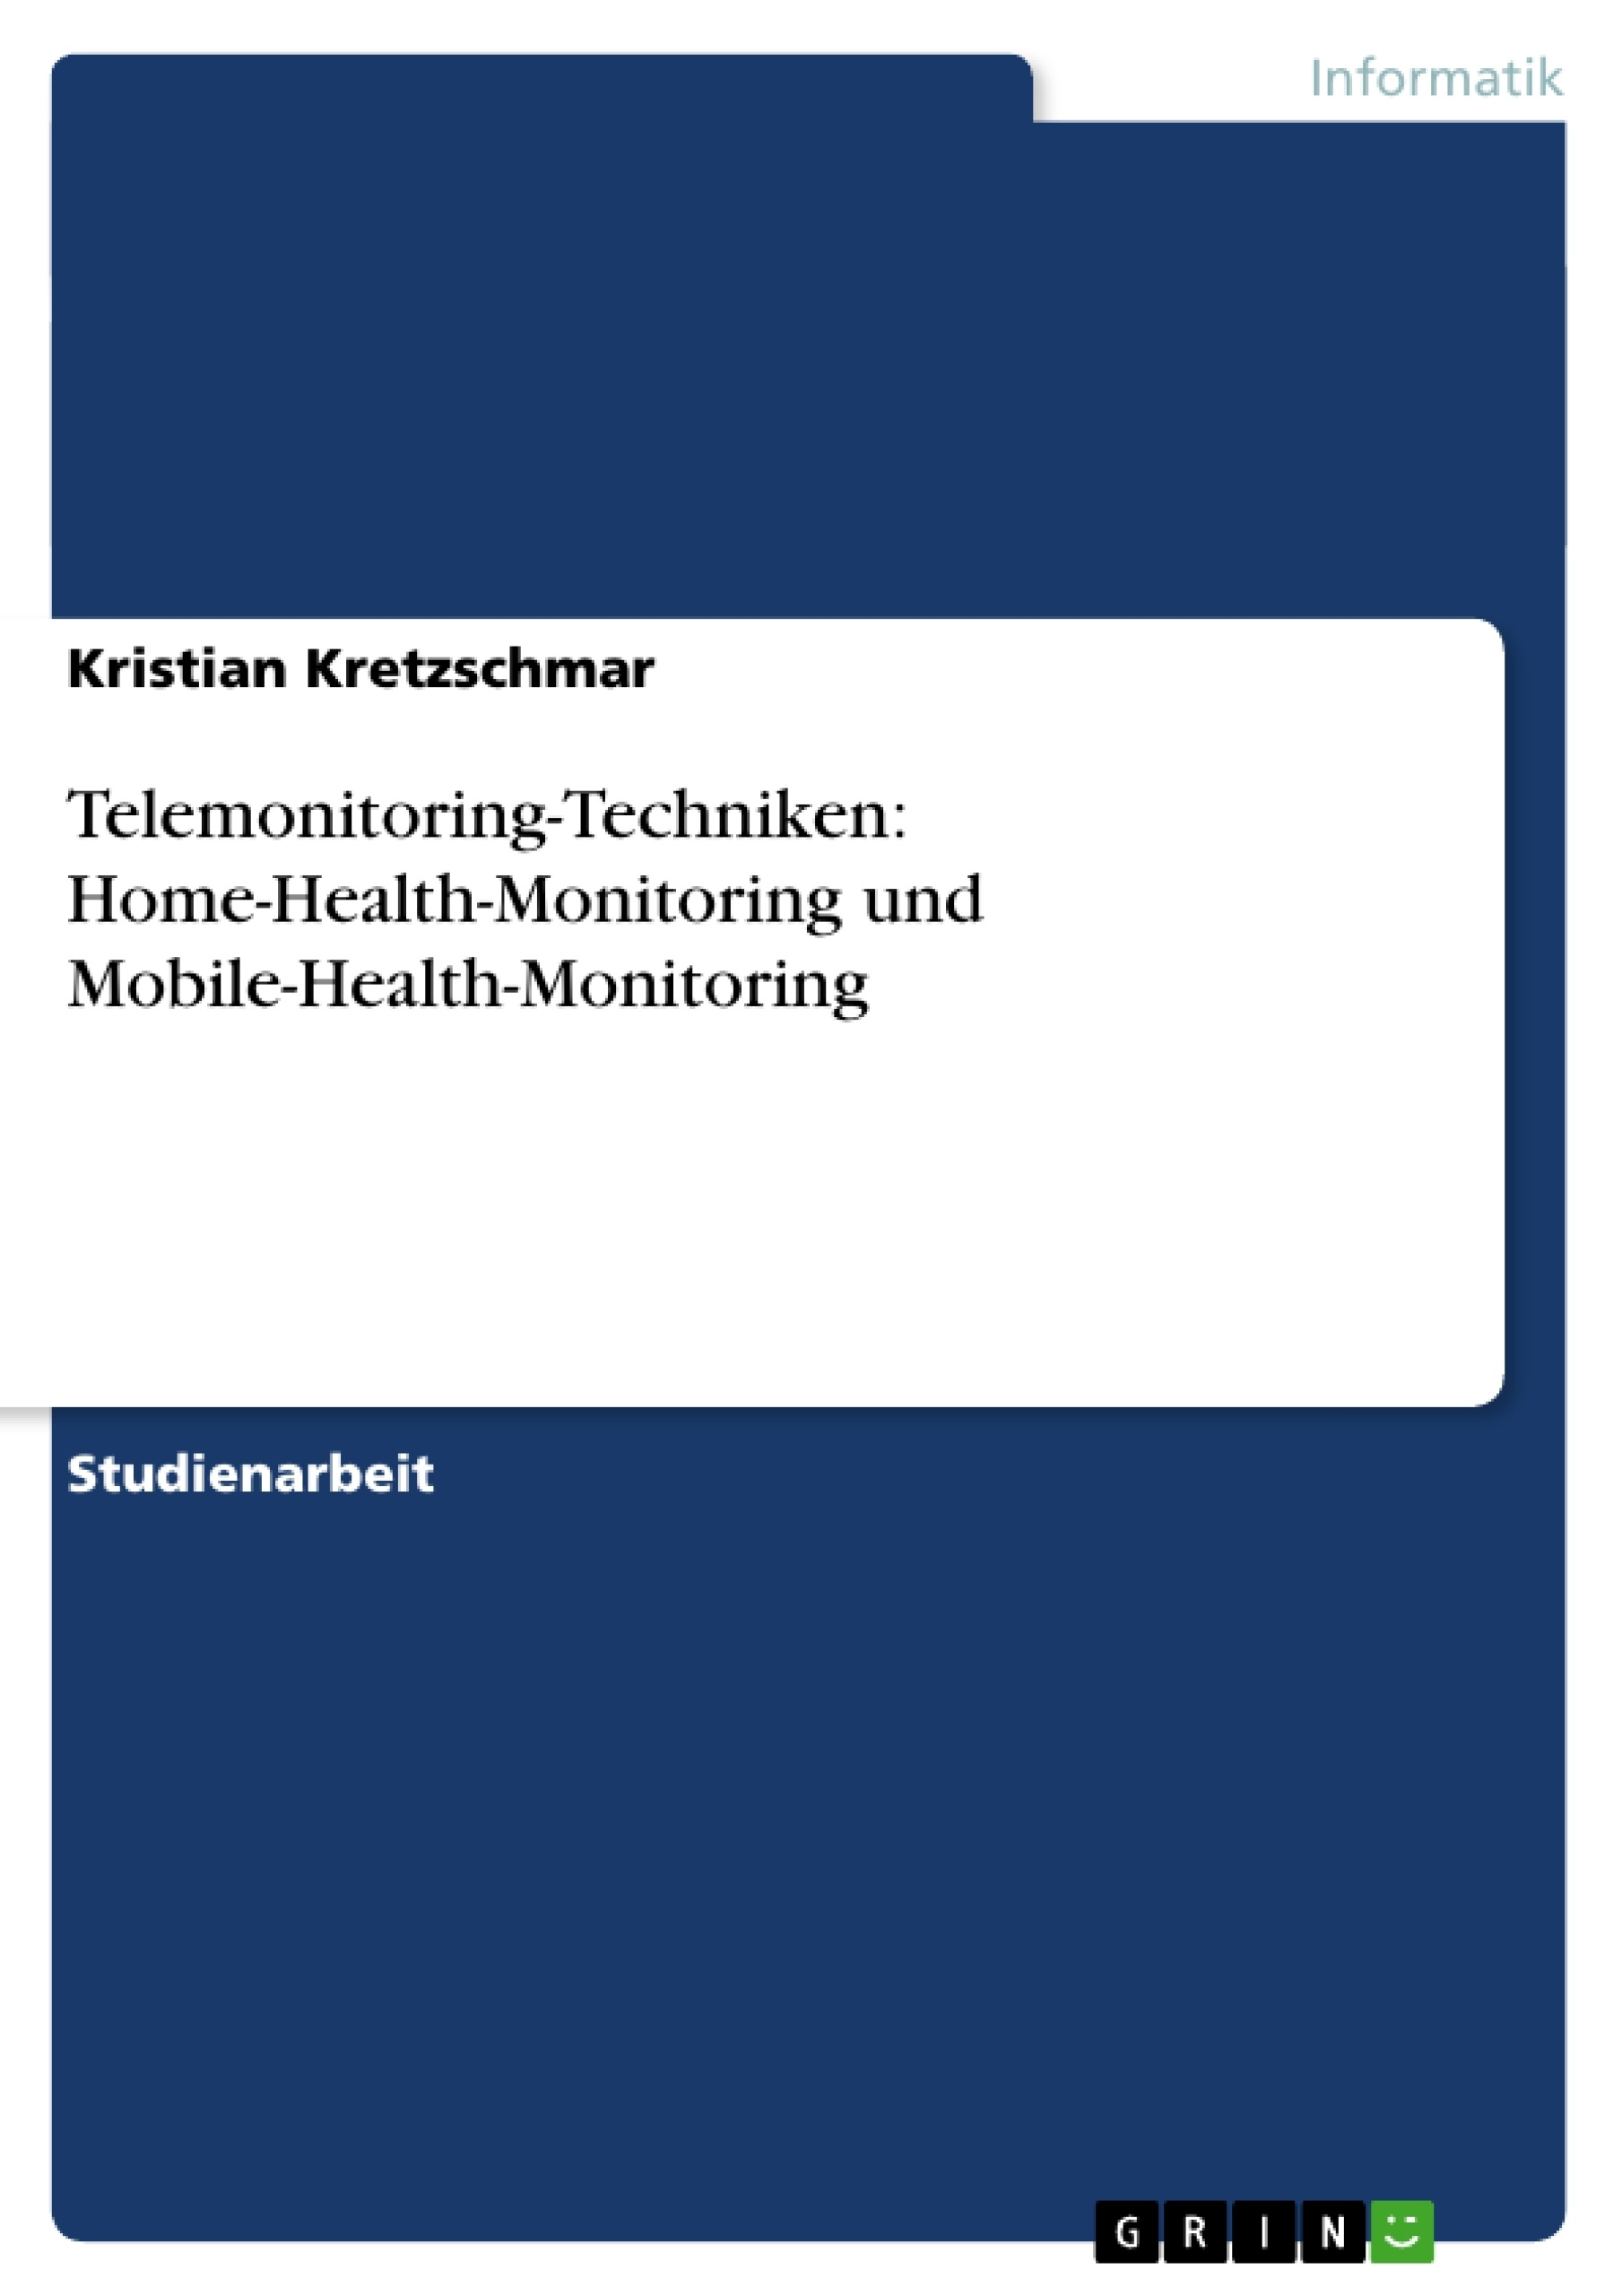 Titel: Telemonitoring-Techniken: Home-Health-Monitoring und Mobile-Health-Monitoring